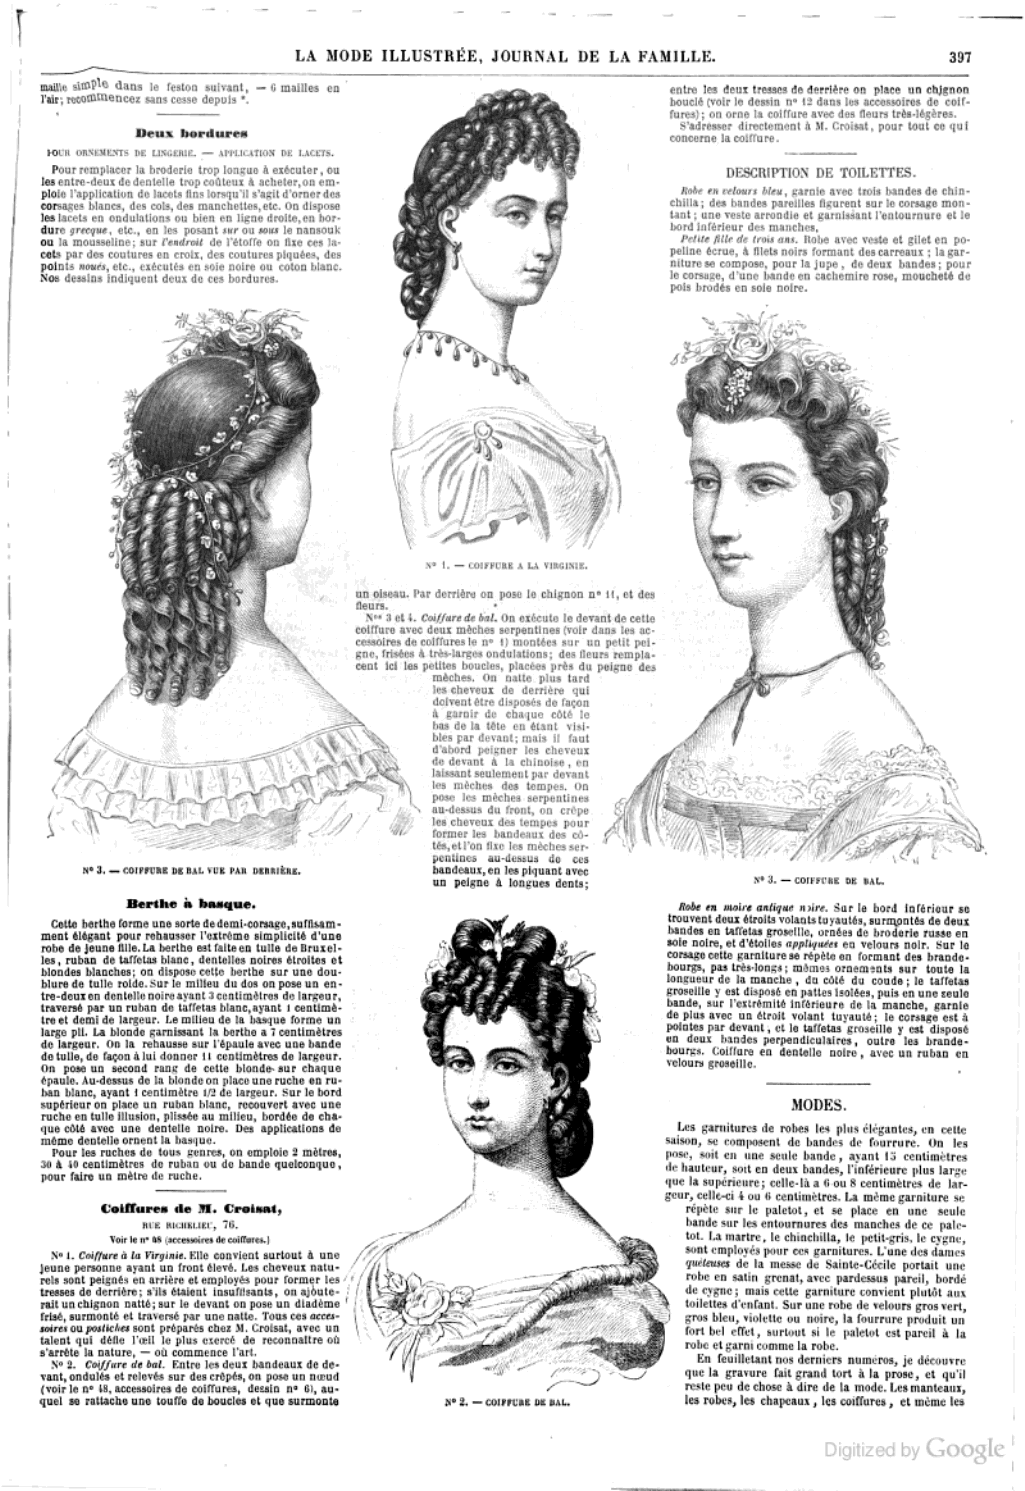 La Mode illustrée: journal de la famille - Google Books December ...